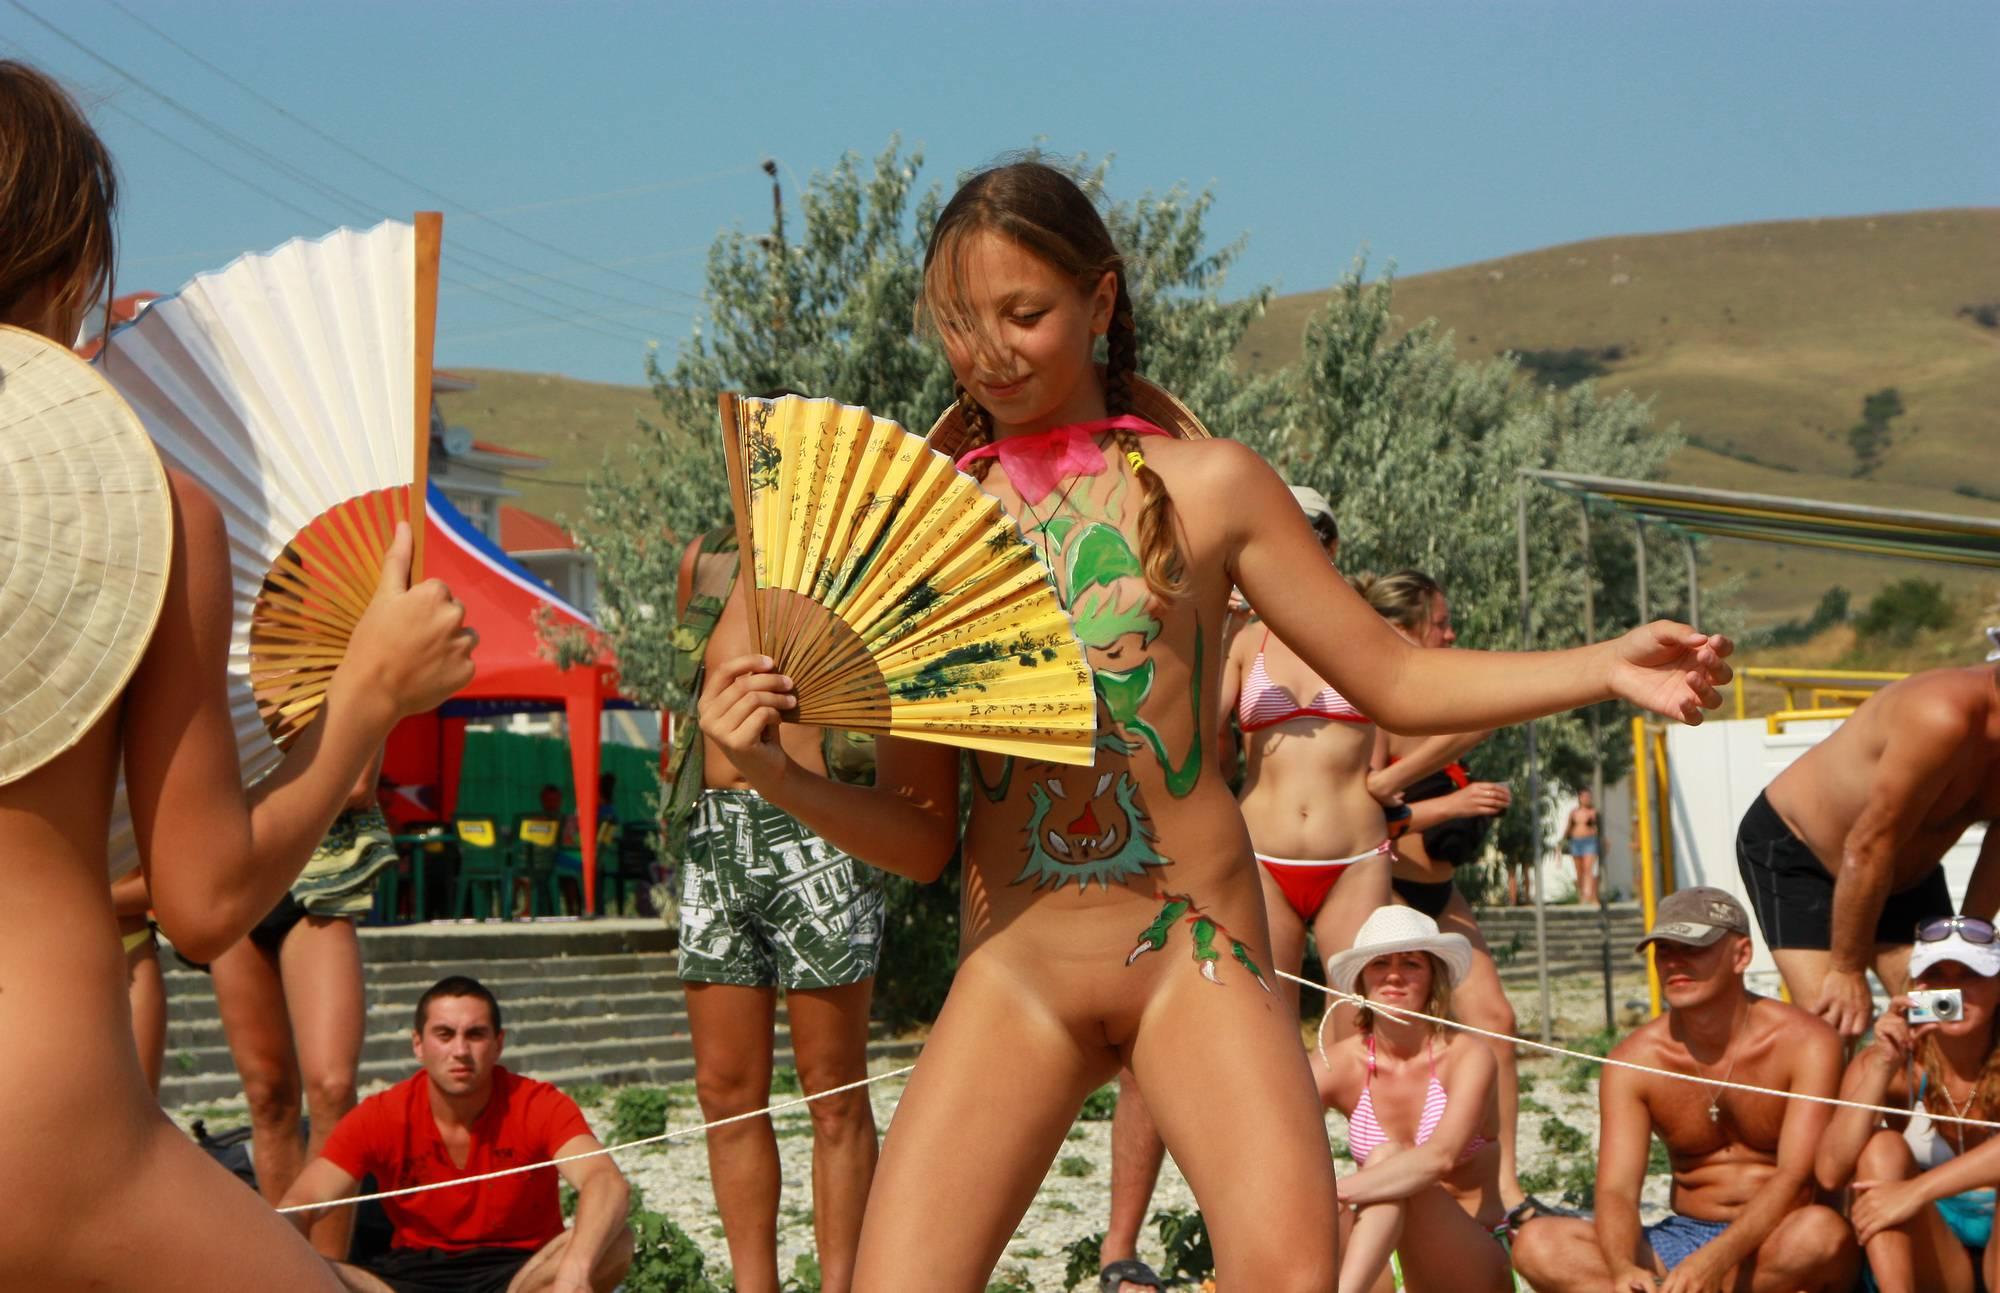 Nudist Photos Miss Natura Hand Fan Play - 2